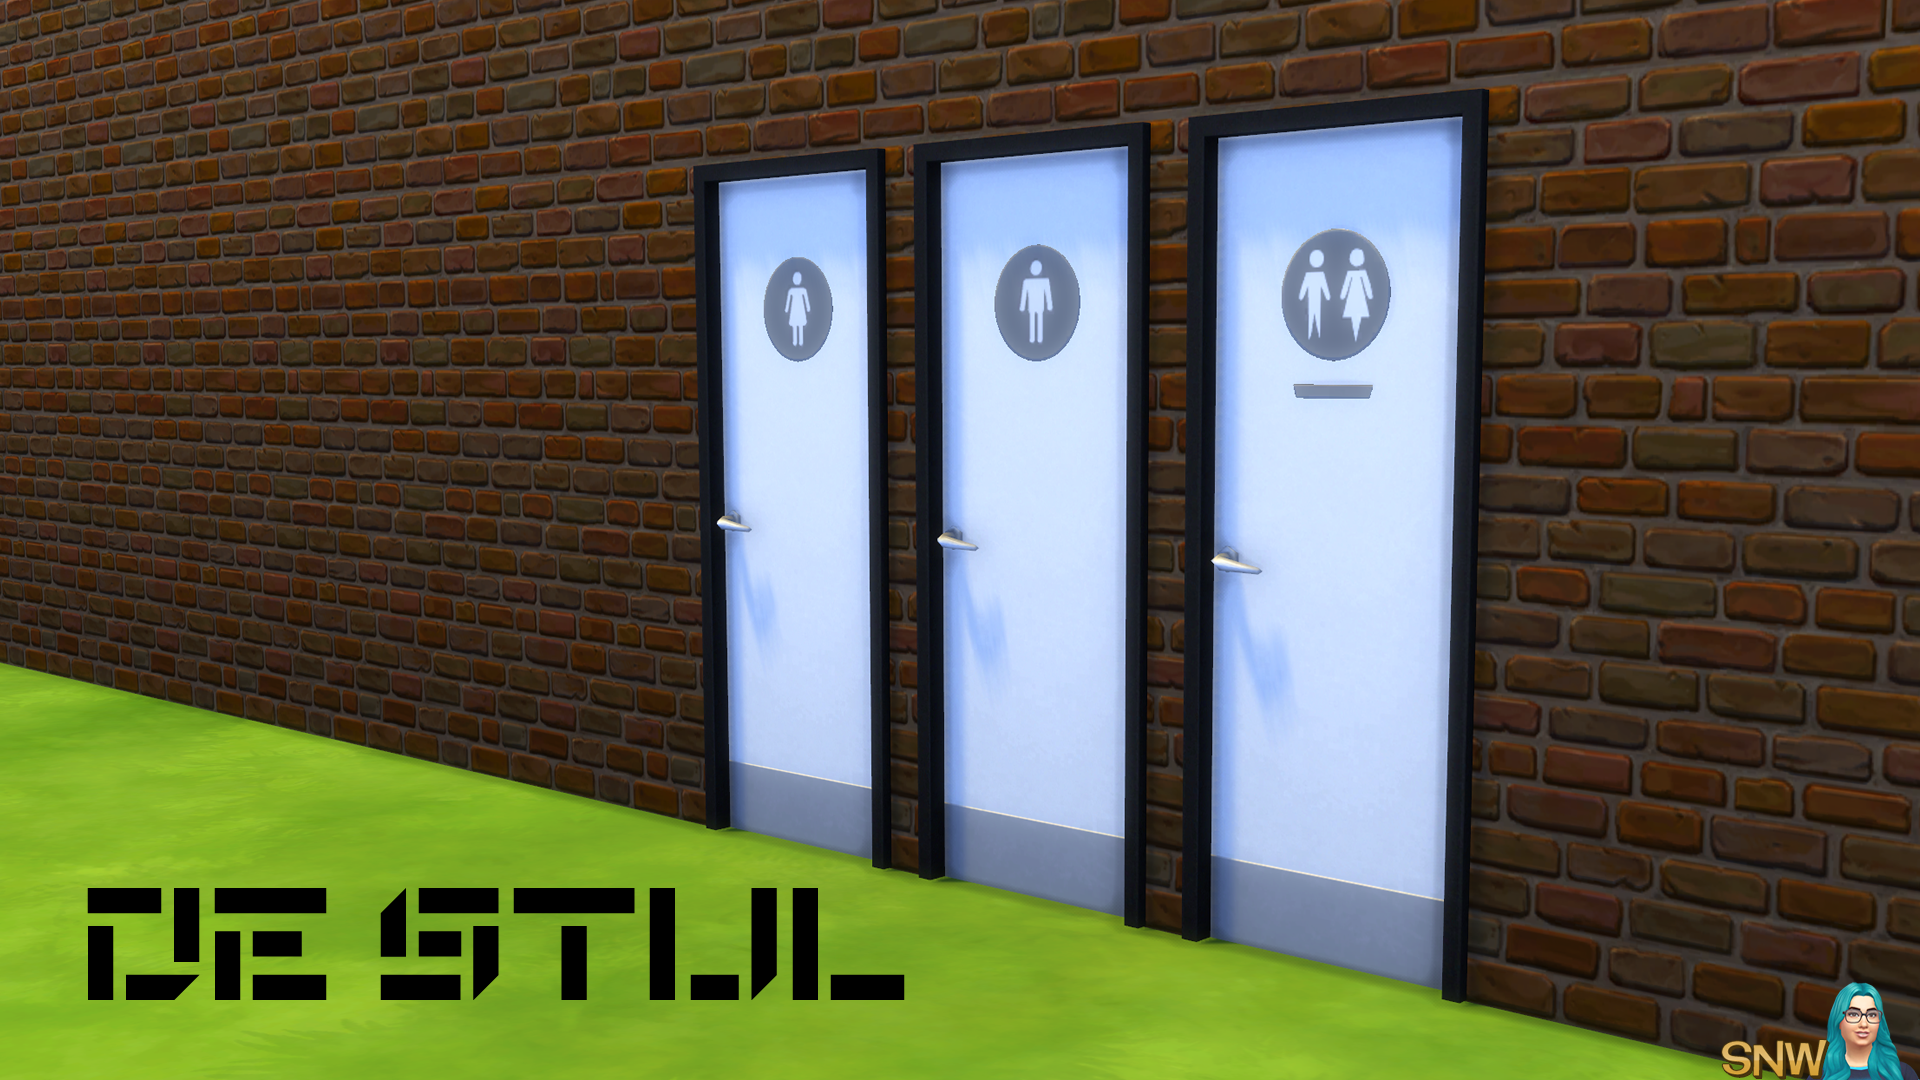 De Stijl Doors for The Sims 4